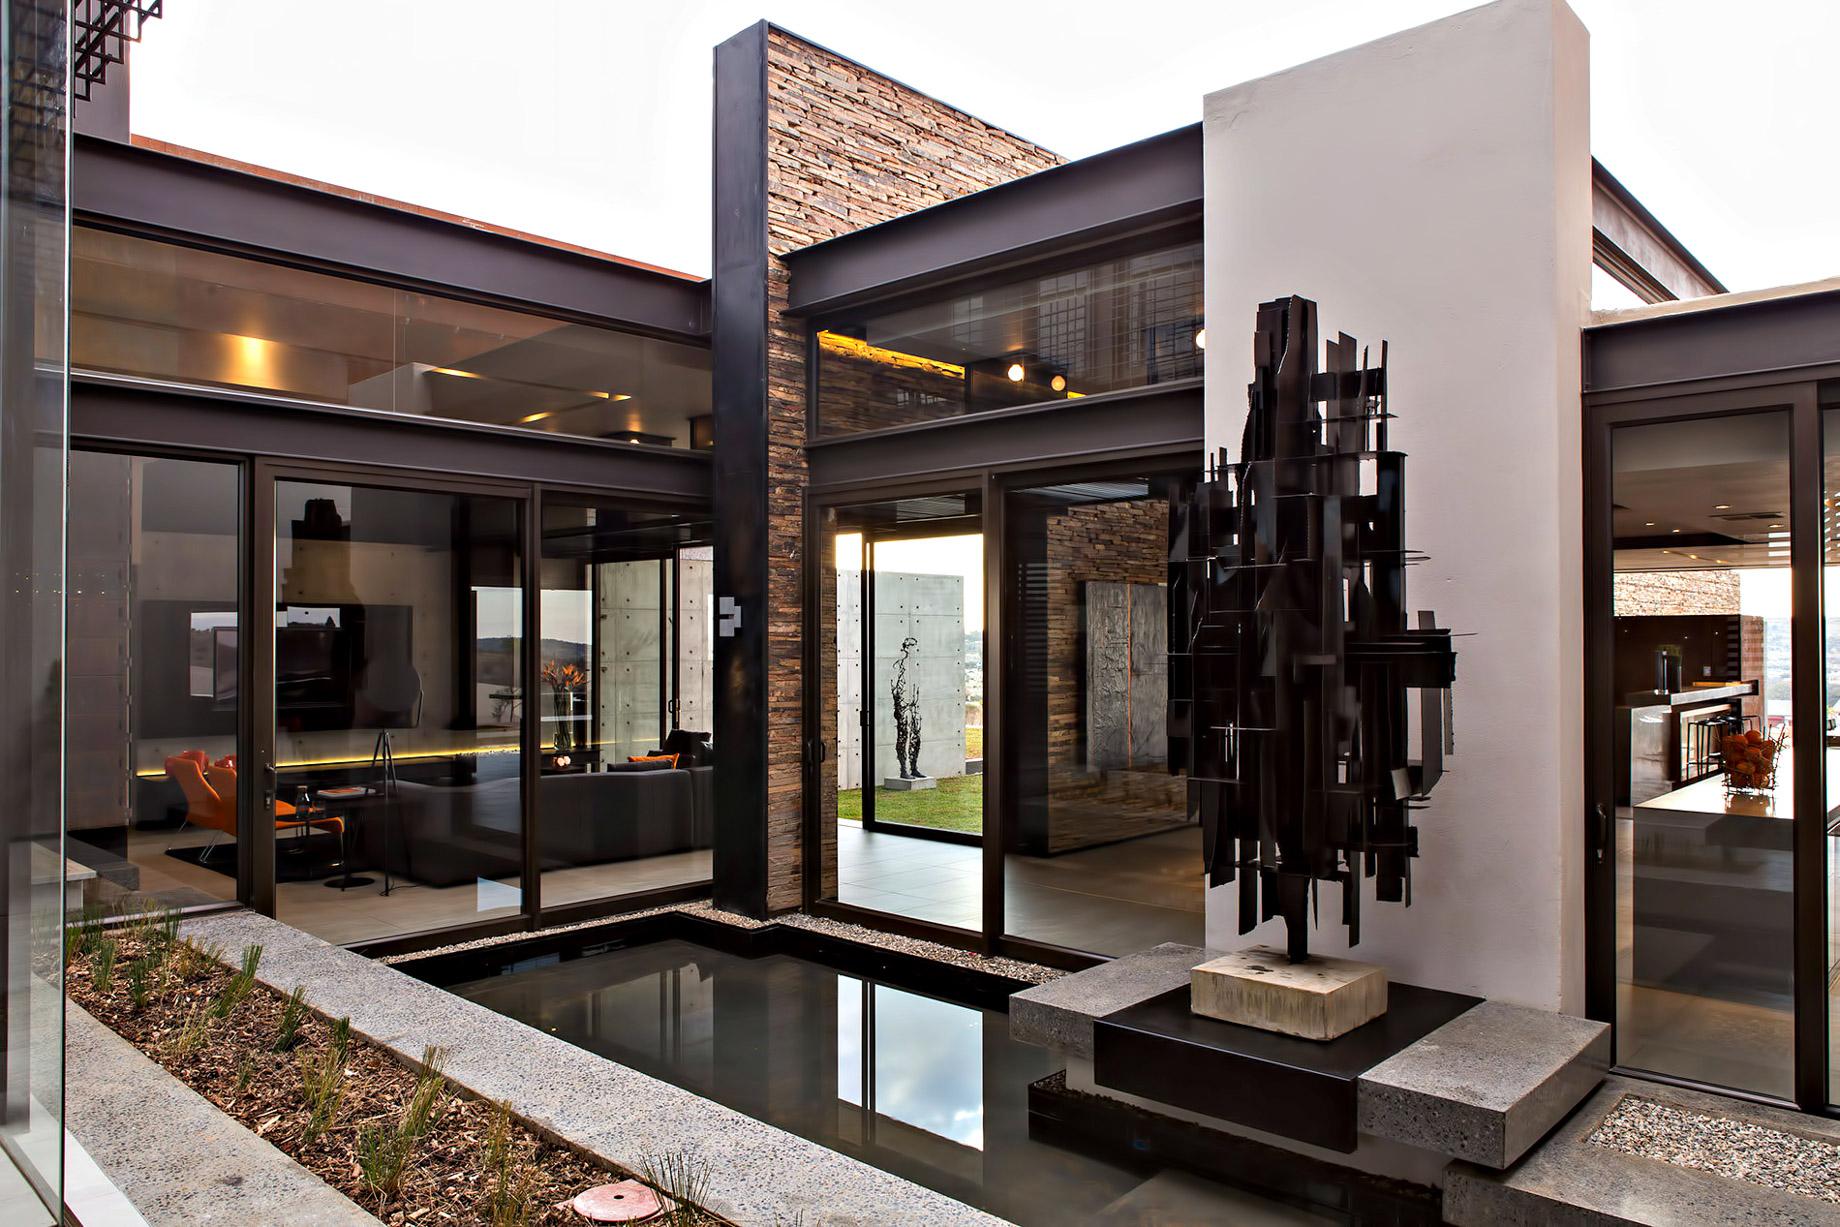 Boz House Luxury Villa - Mooikloof Heights, Pretoria, South Africa